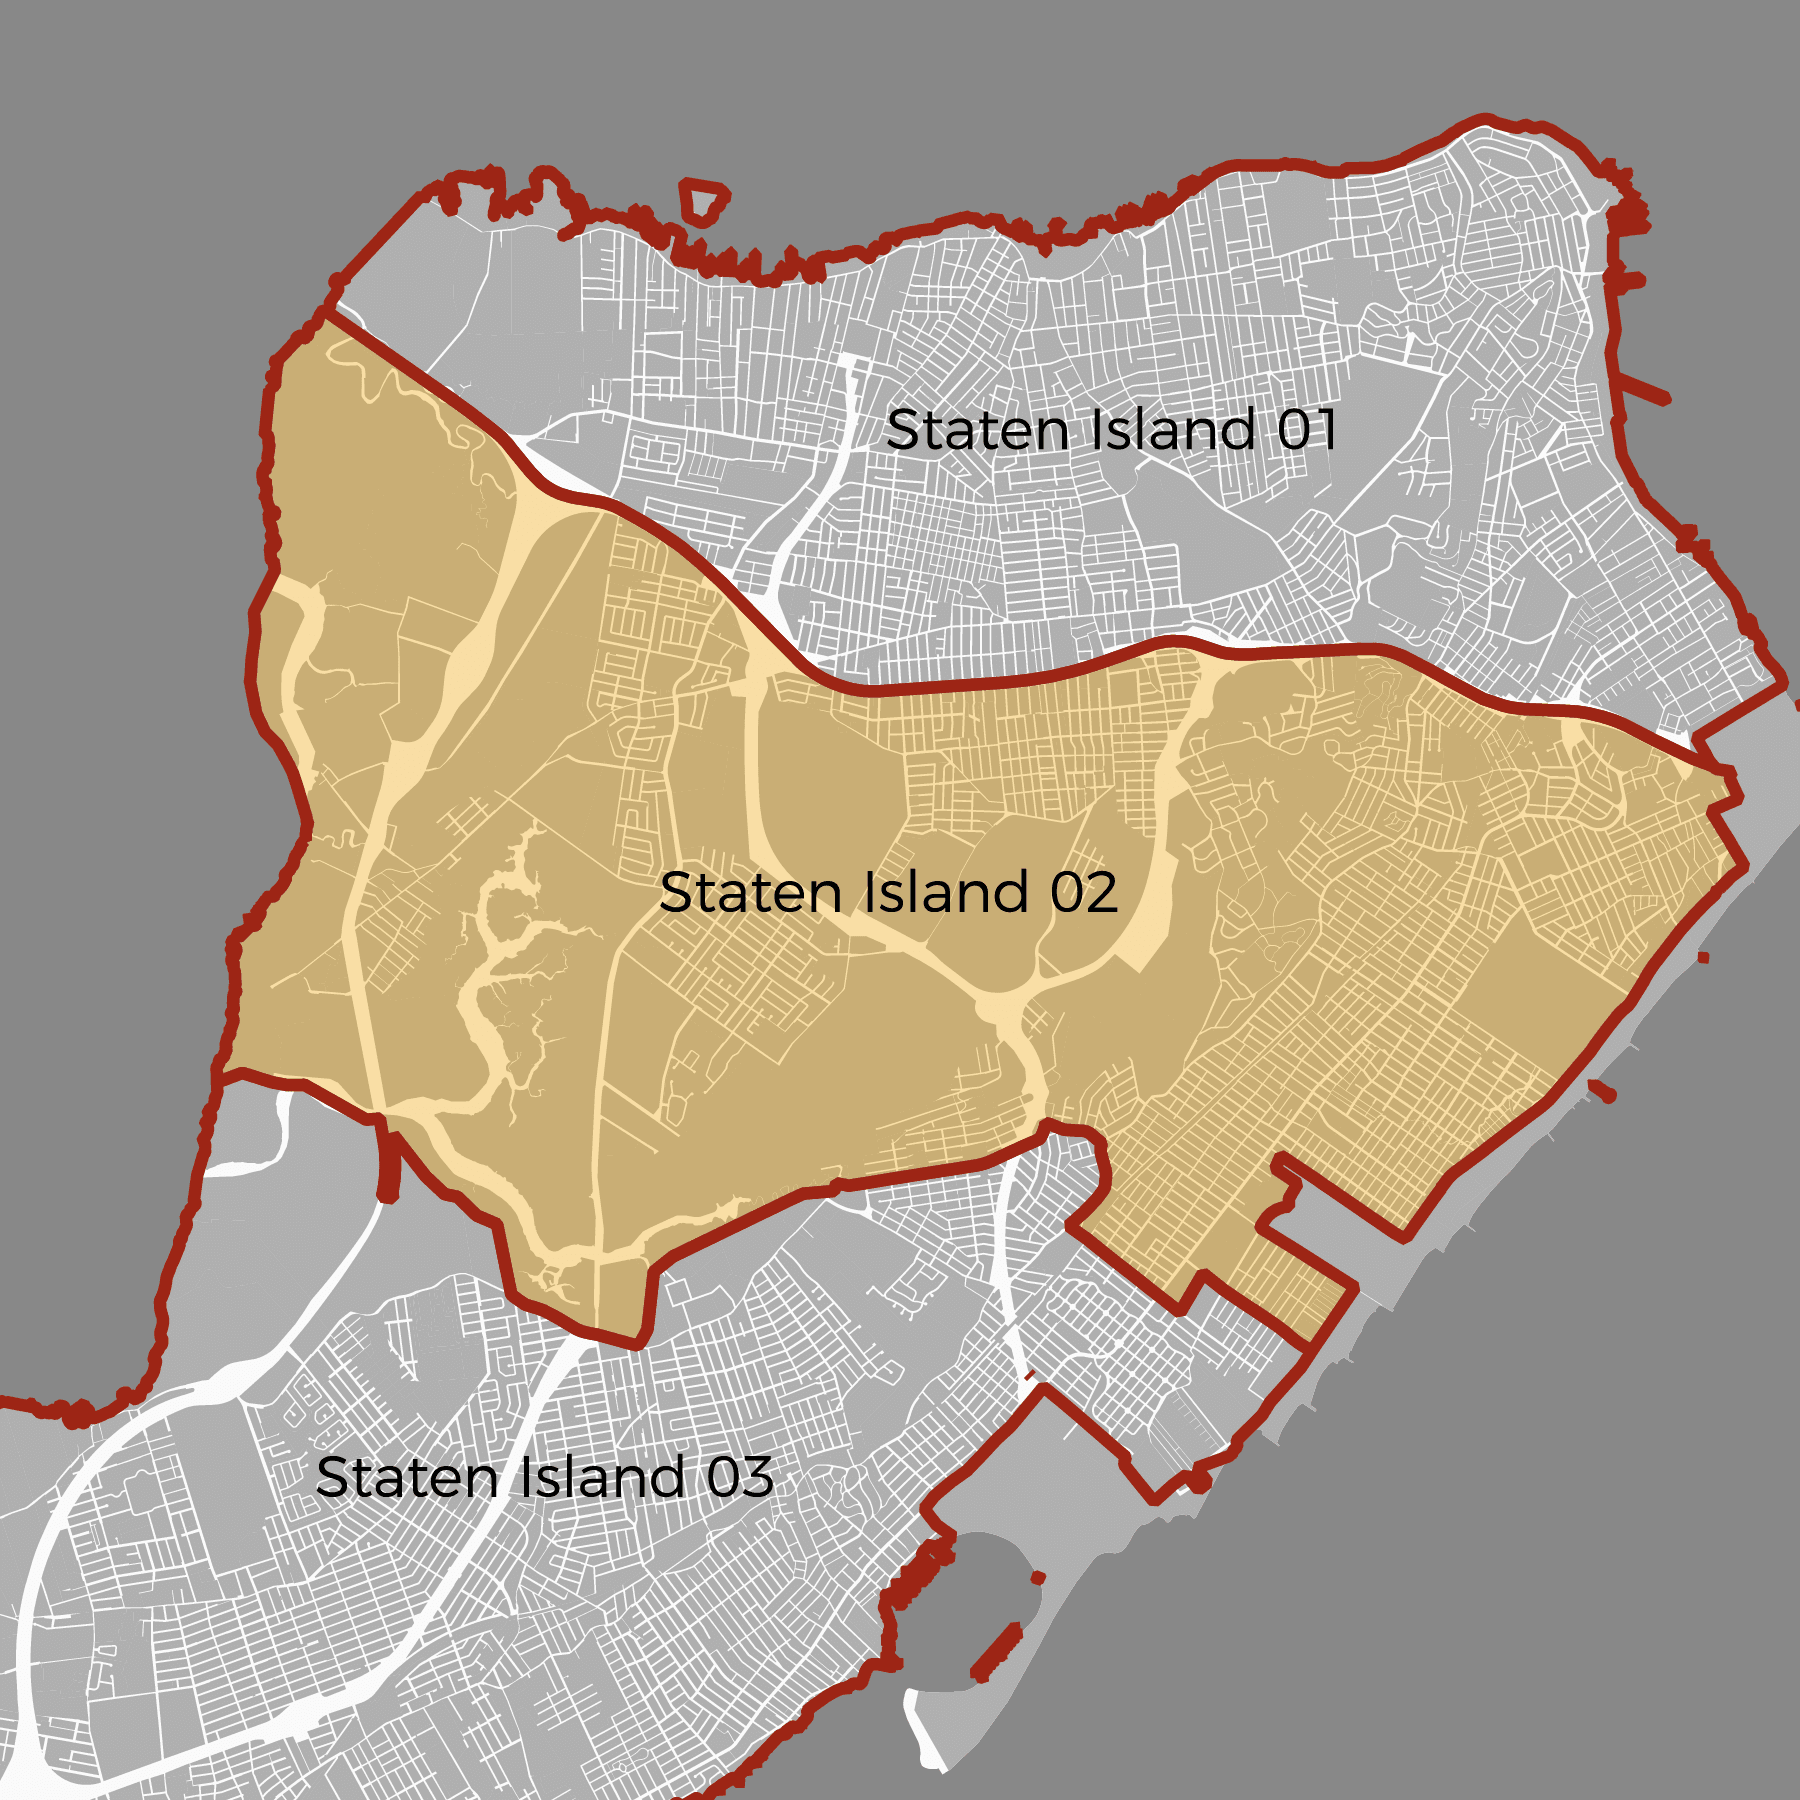 Staten Island Community Board 2